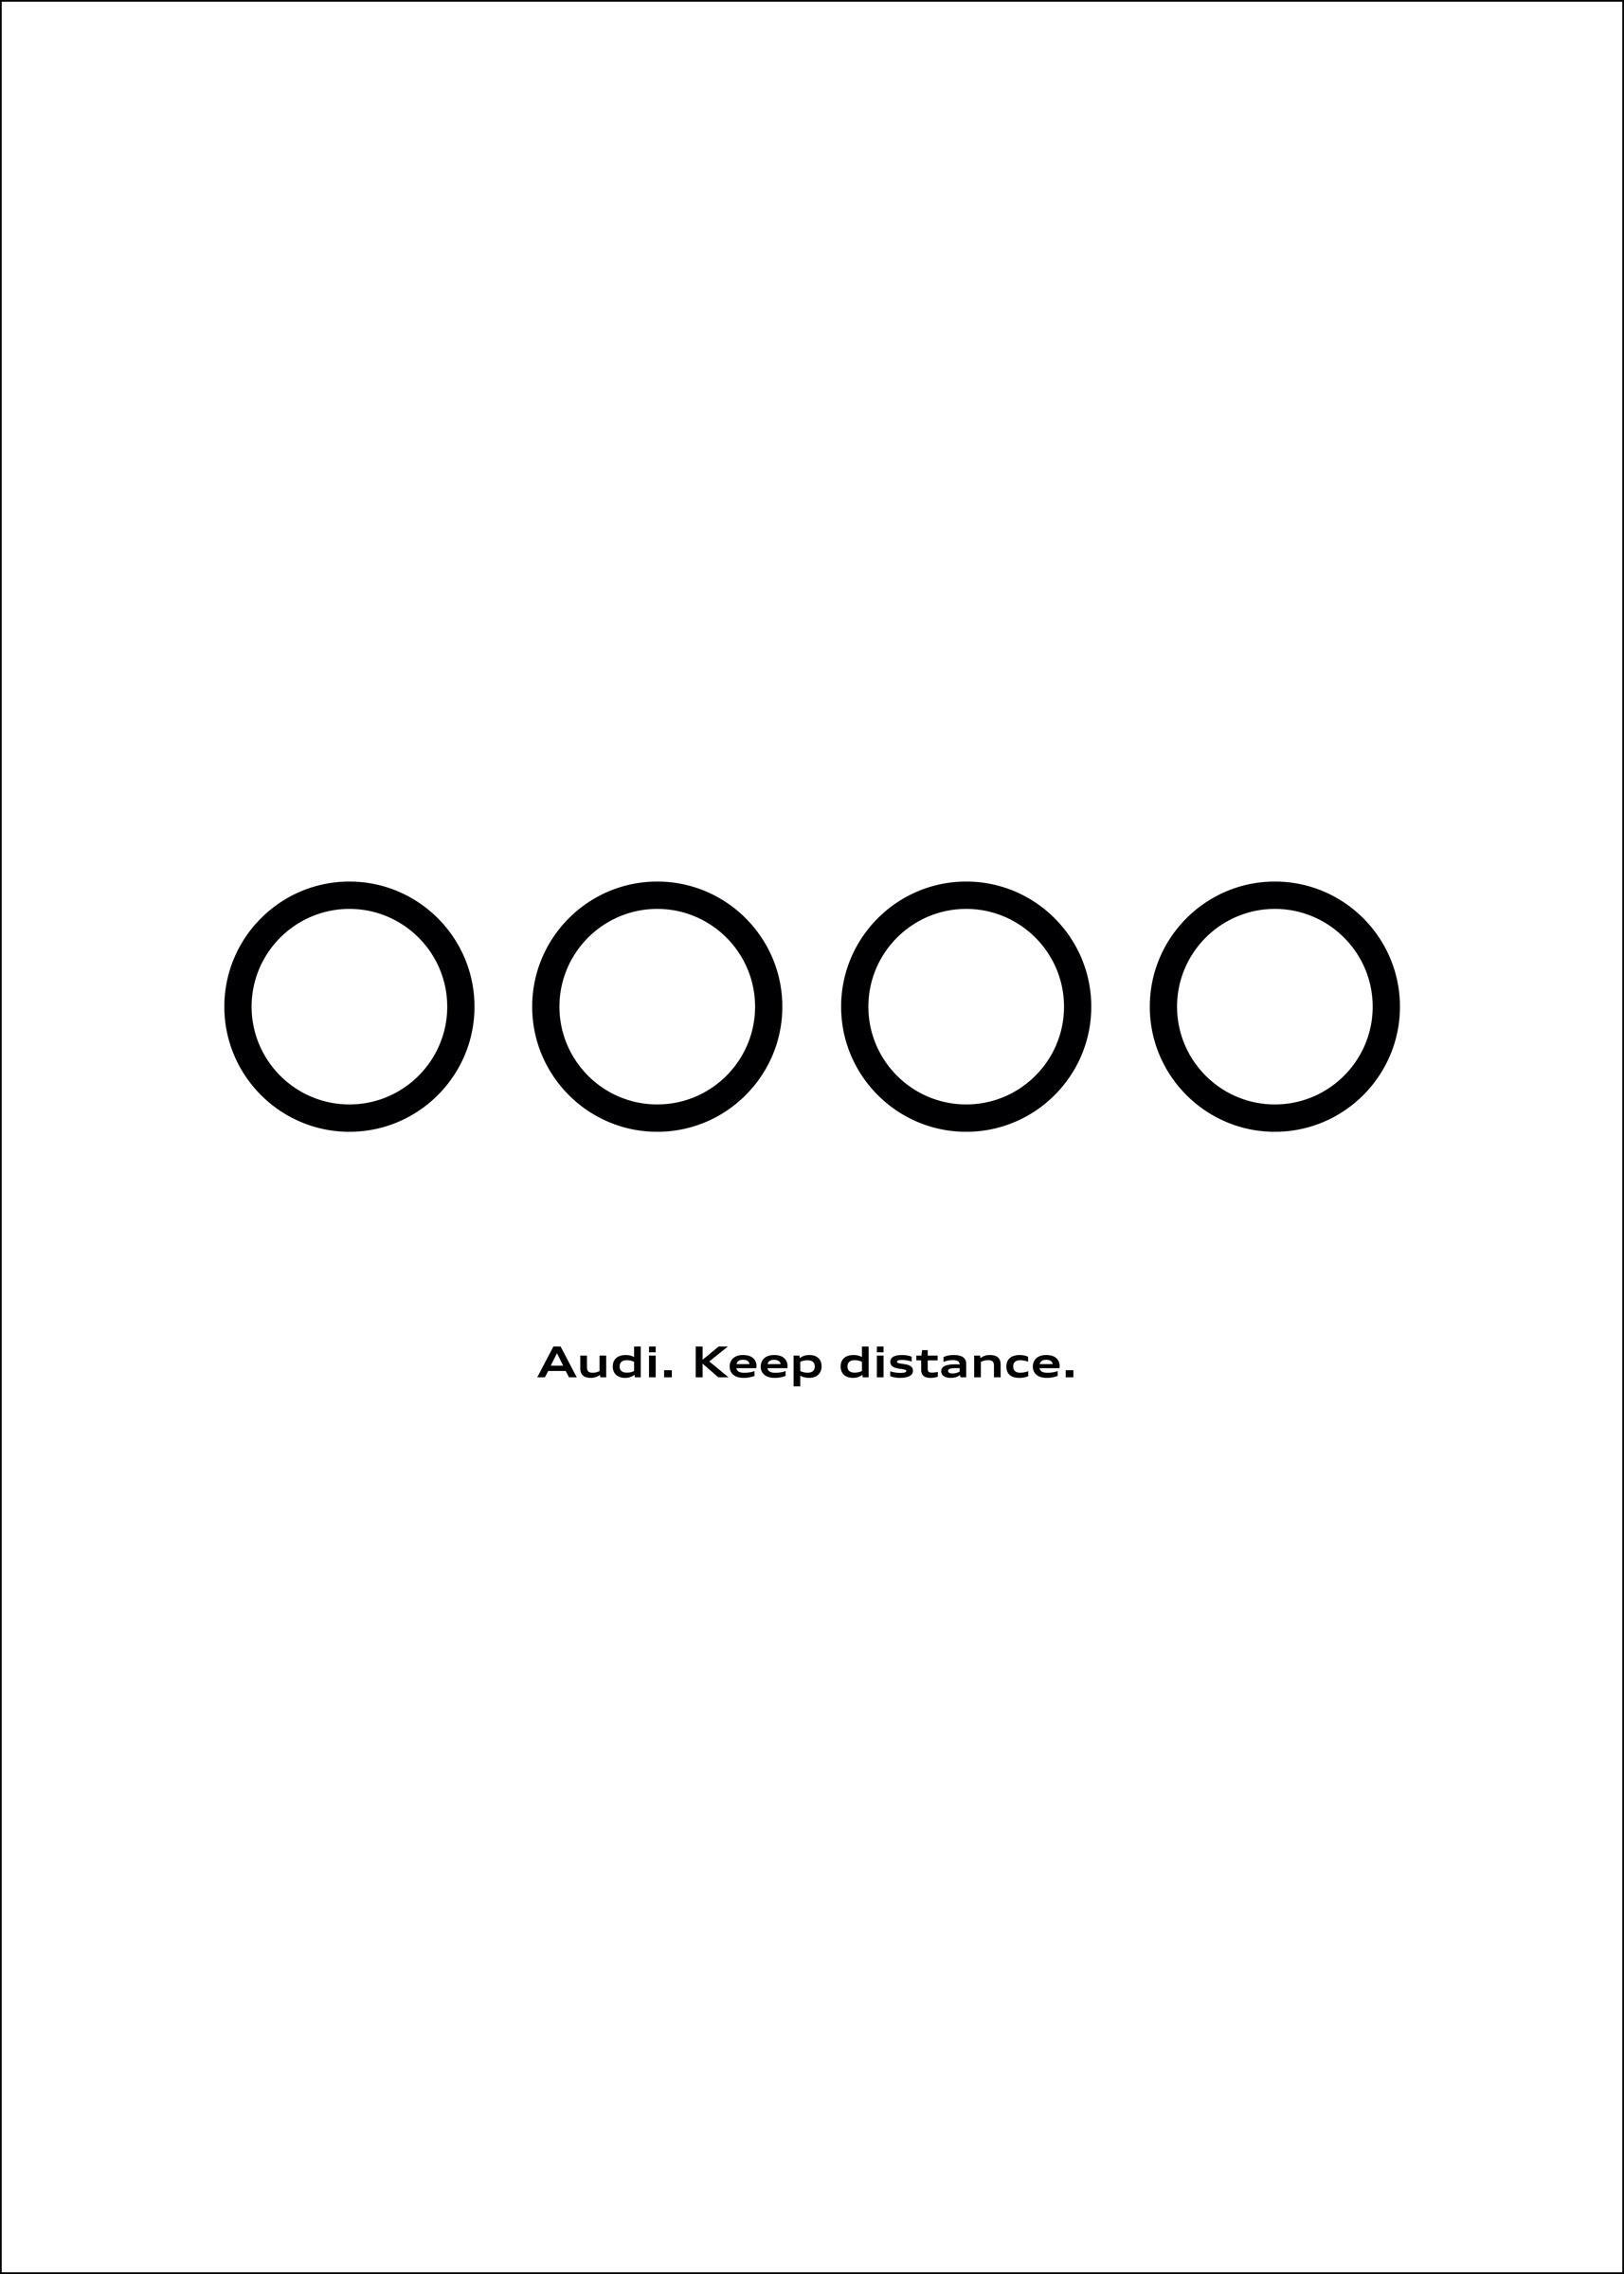 audi_keep_distance_resized